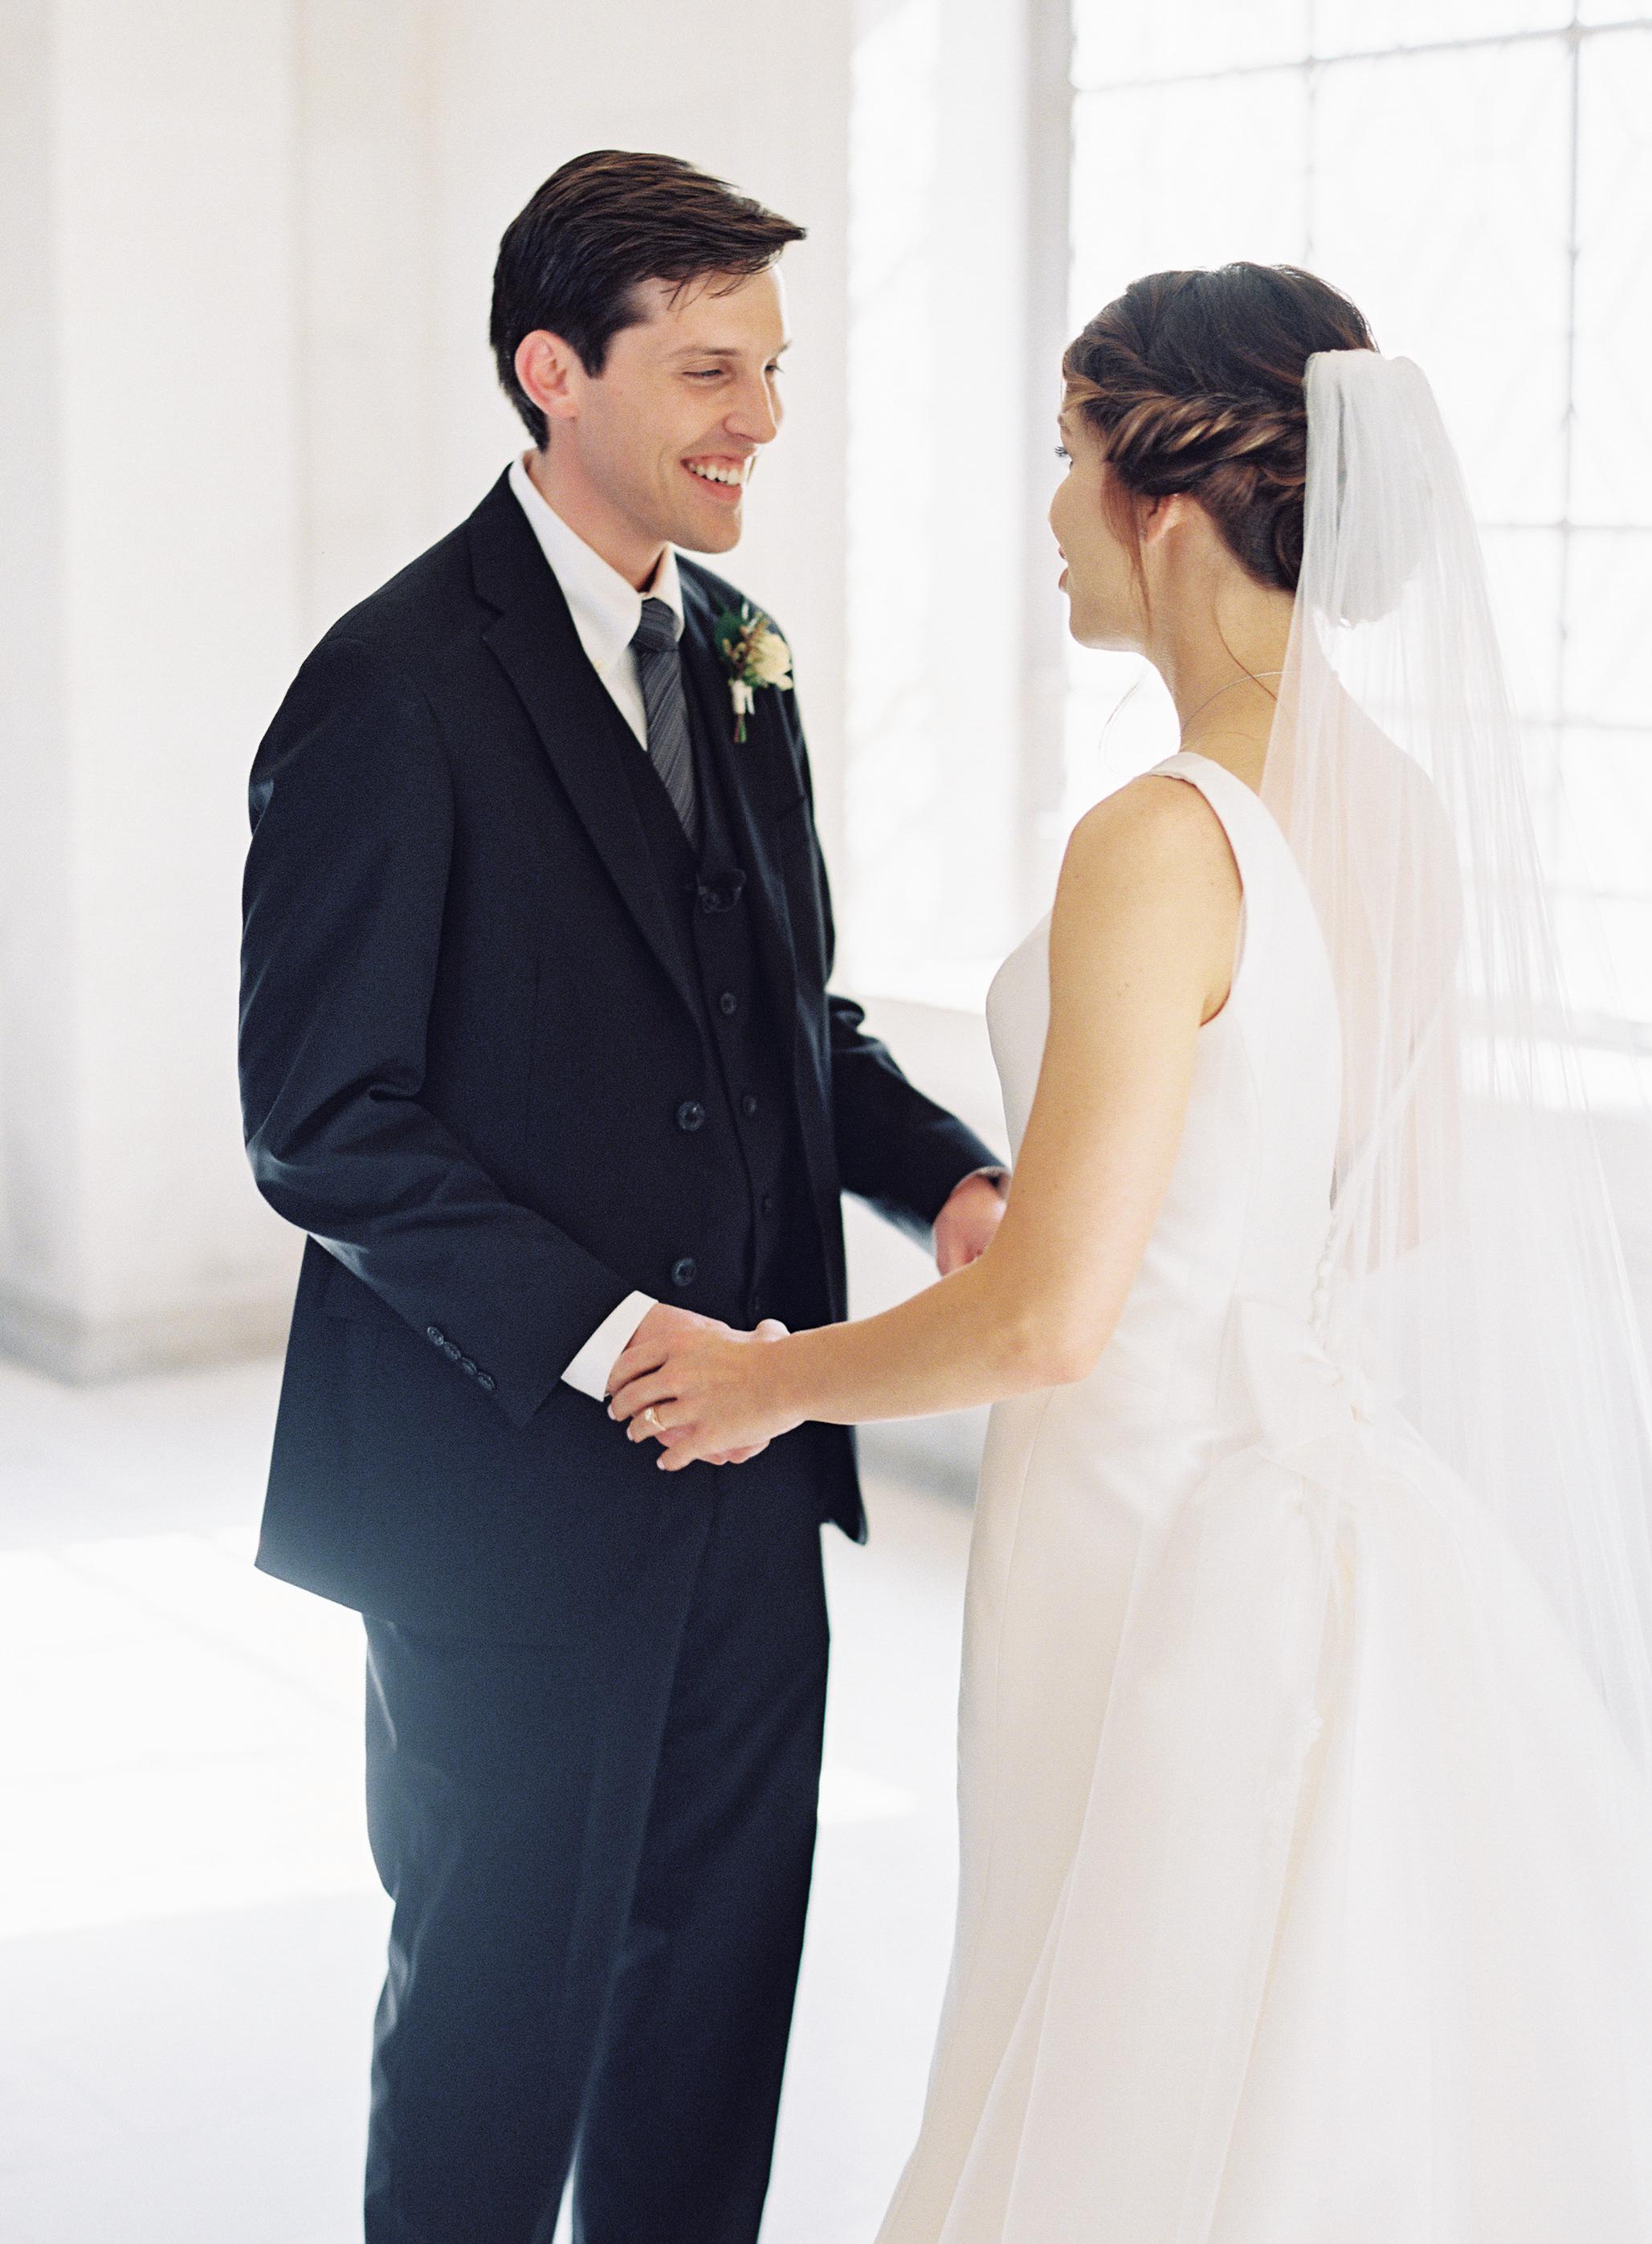 Meghan Mehan Photography - California Wedding Photographer | San Francisco City Hall Wedding 012.jpg